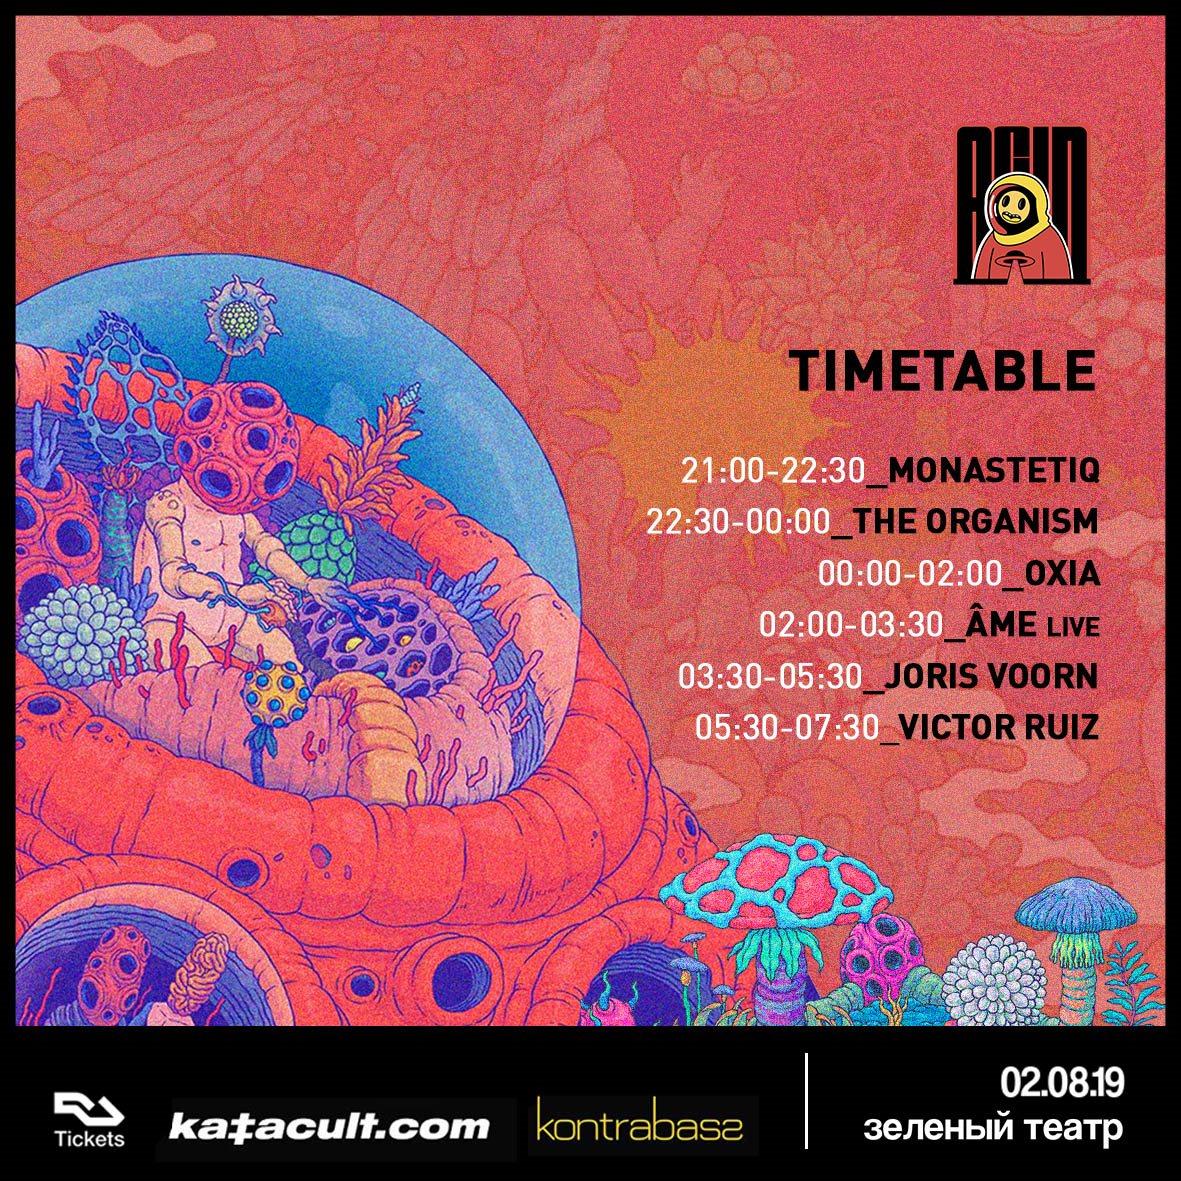 ACID KYIV: Joris Voorn, Âme Live, Victor Ruiz, Oxia, The Organism, Monastetiq - Flyer back